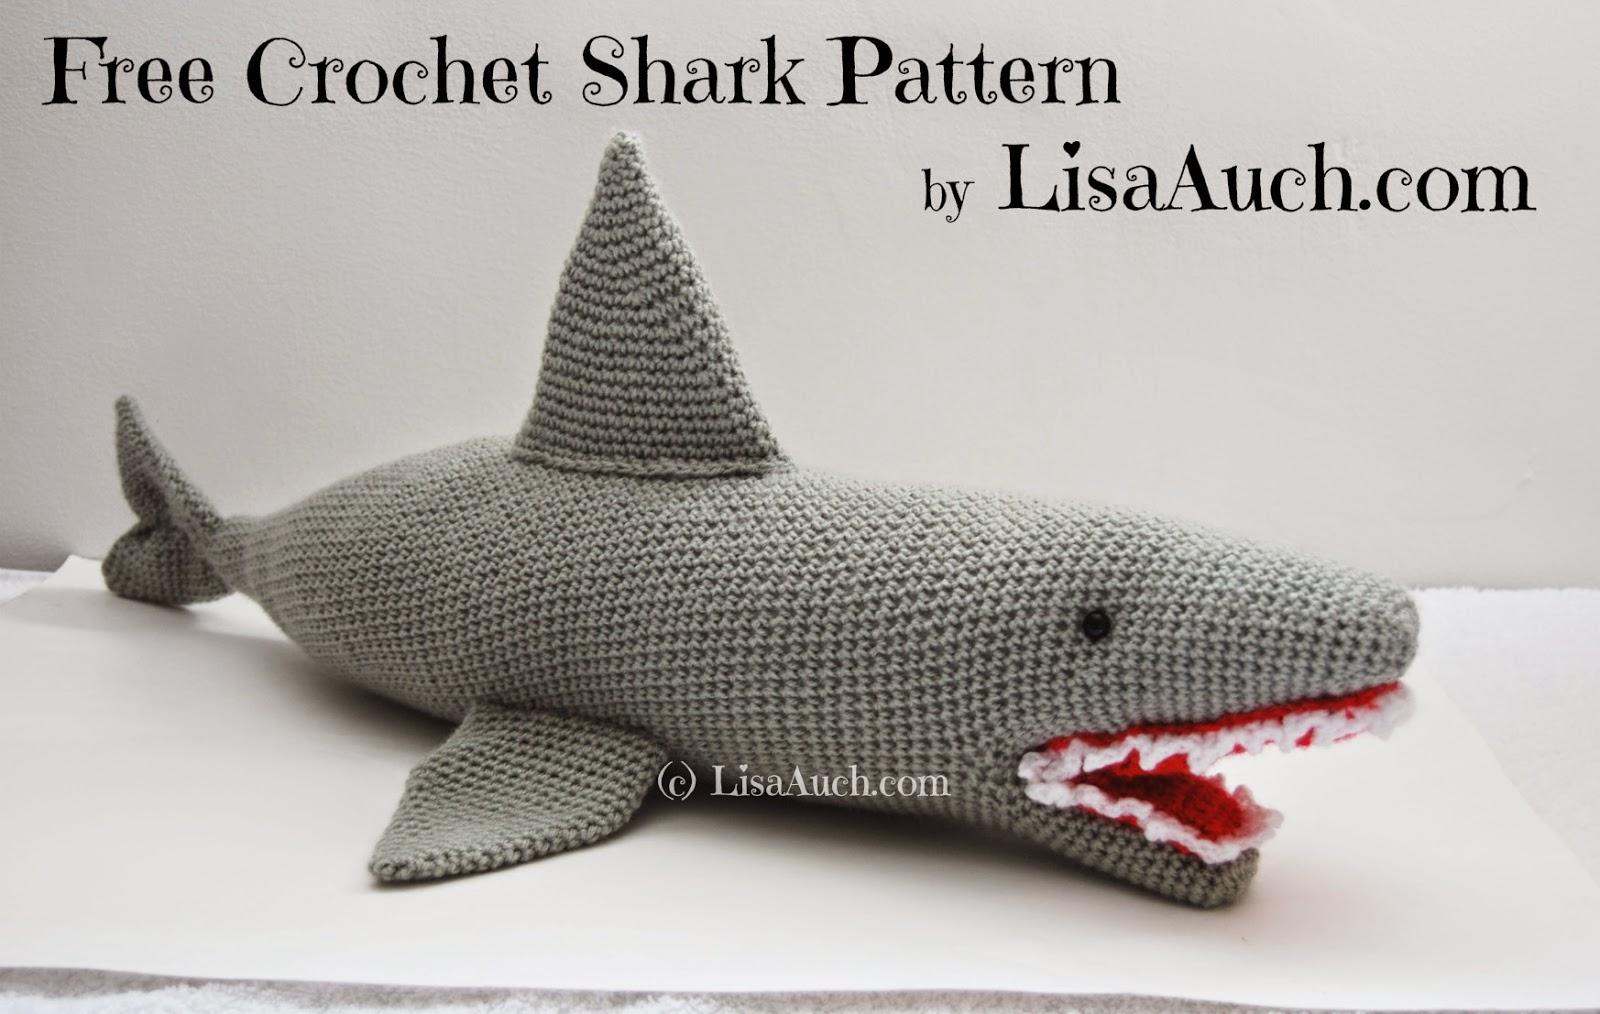 Crochet shark slippers pattern free shark shark slippers crochet archives page 39 of 43 cool creativities bankloansurffo Gallery